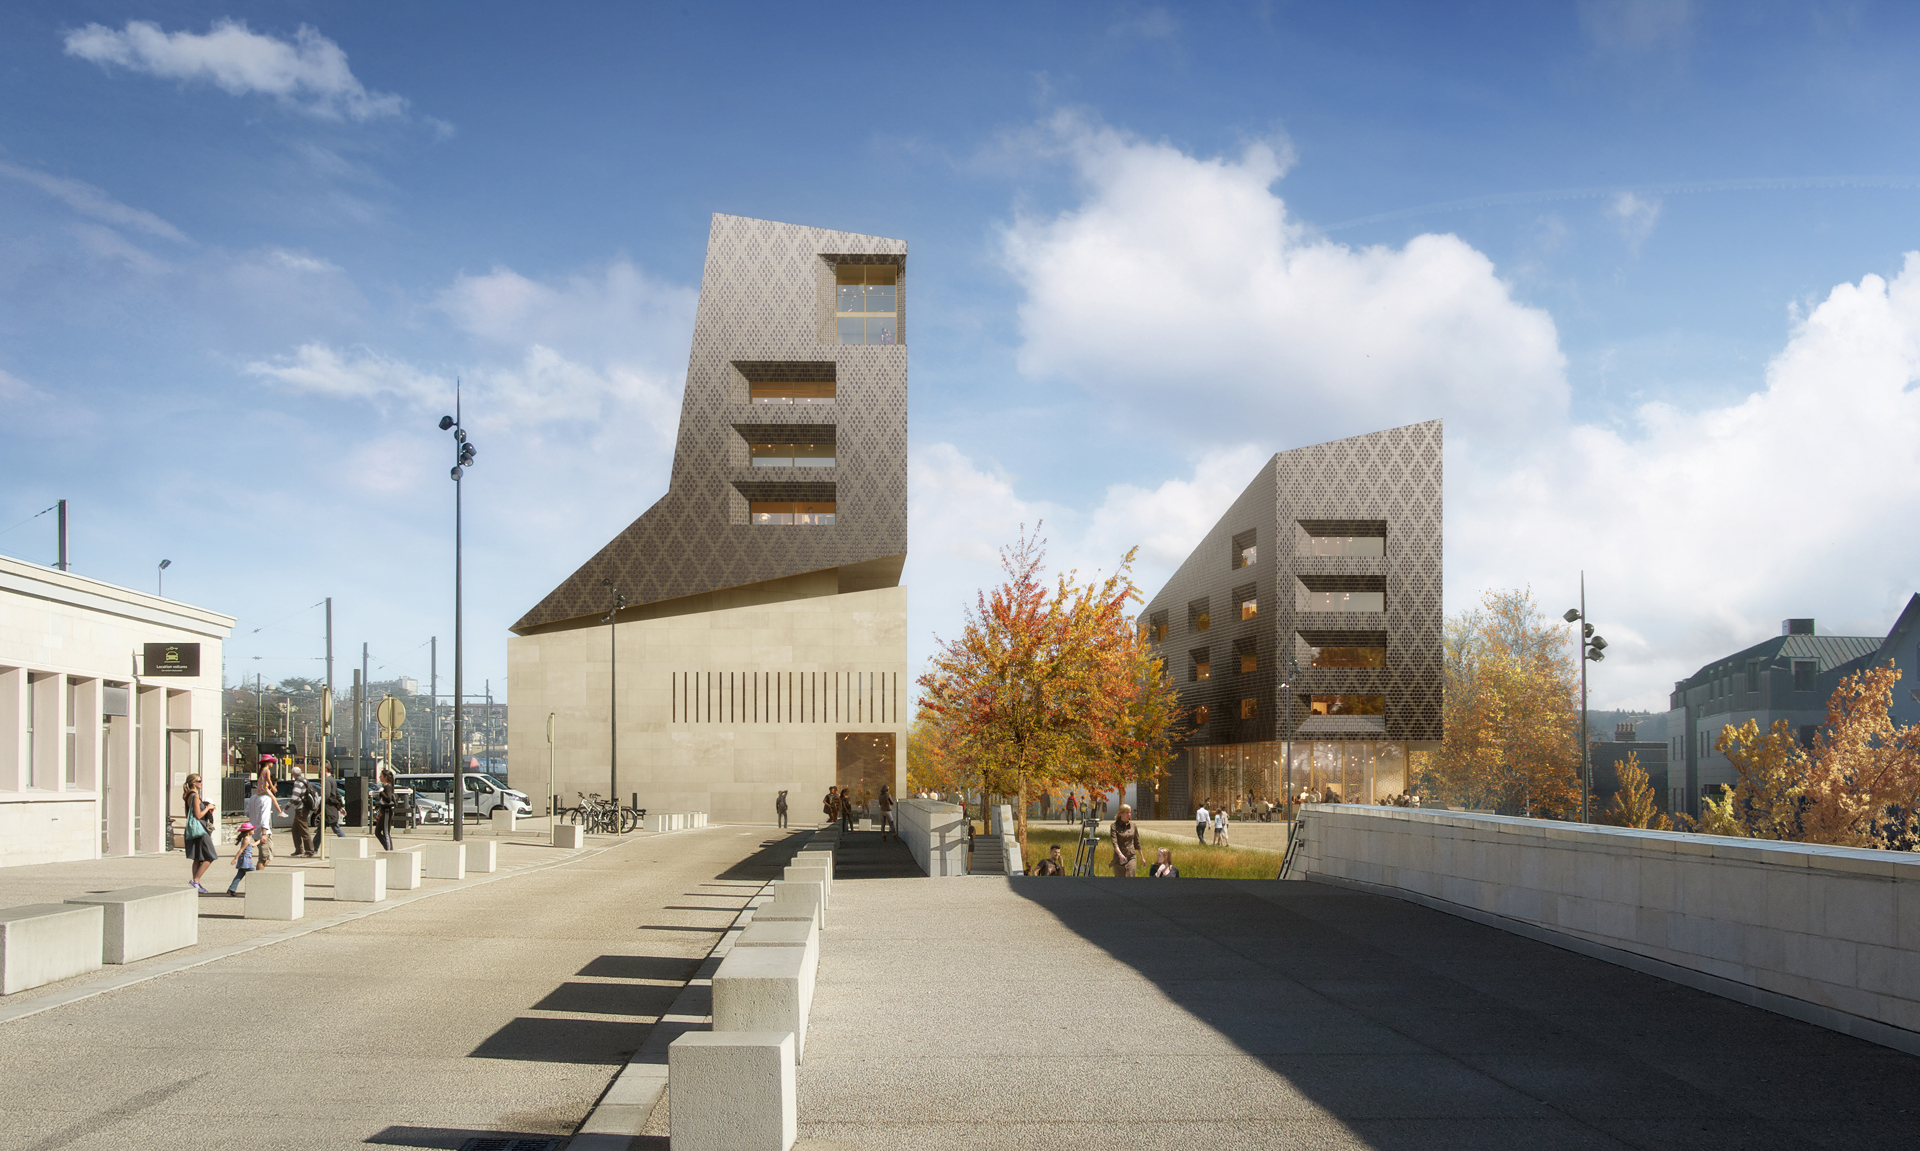 VEZZONI-Quartier de la Gare Besançon-VUE FRONTALE_mdf_full